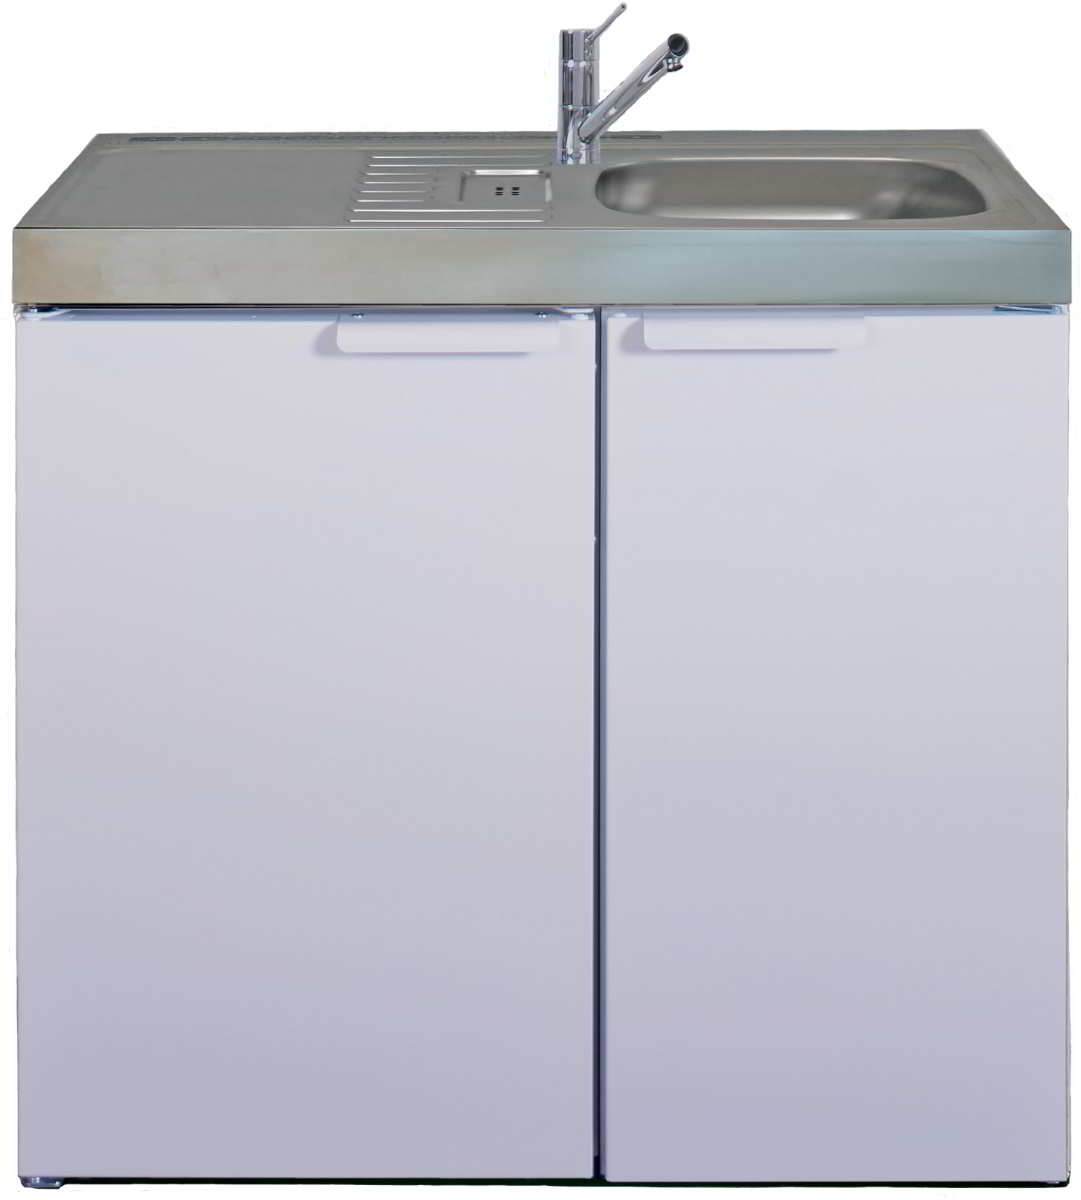 Full Size of Respekta Miniküche Mit Kühlschrank Miniküche Mit Kühlschrank Gebraucht Miniküche Mit Backofen Ohne Kühlschrank Miniküche 120 Cm Breit Mit Kühlschrank Küche Miniküche Mit Kühlschrank